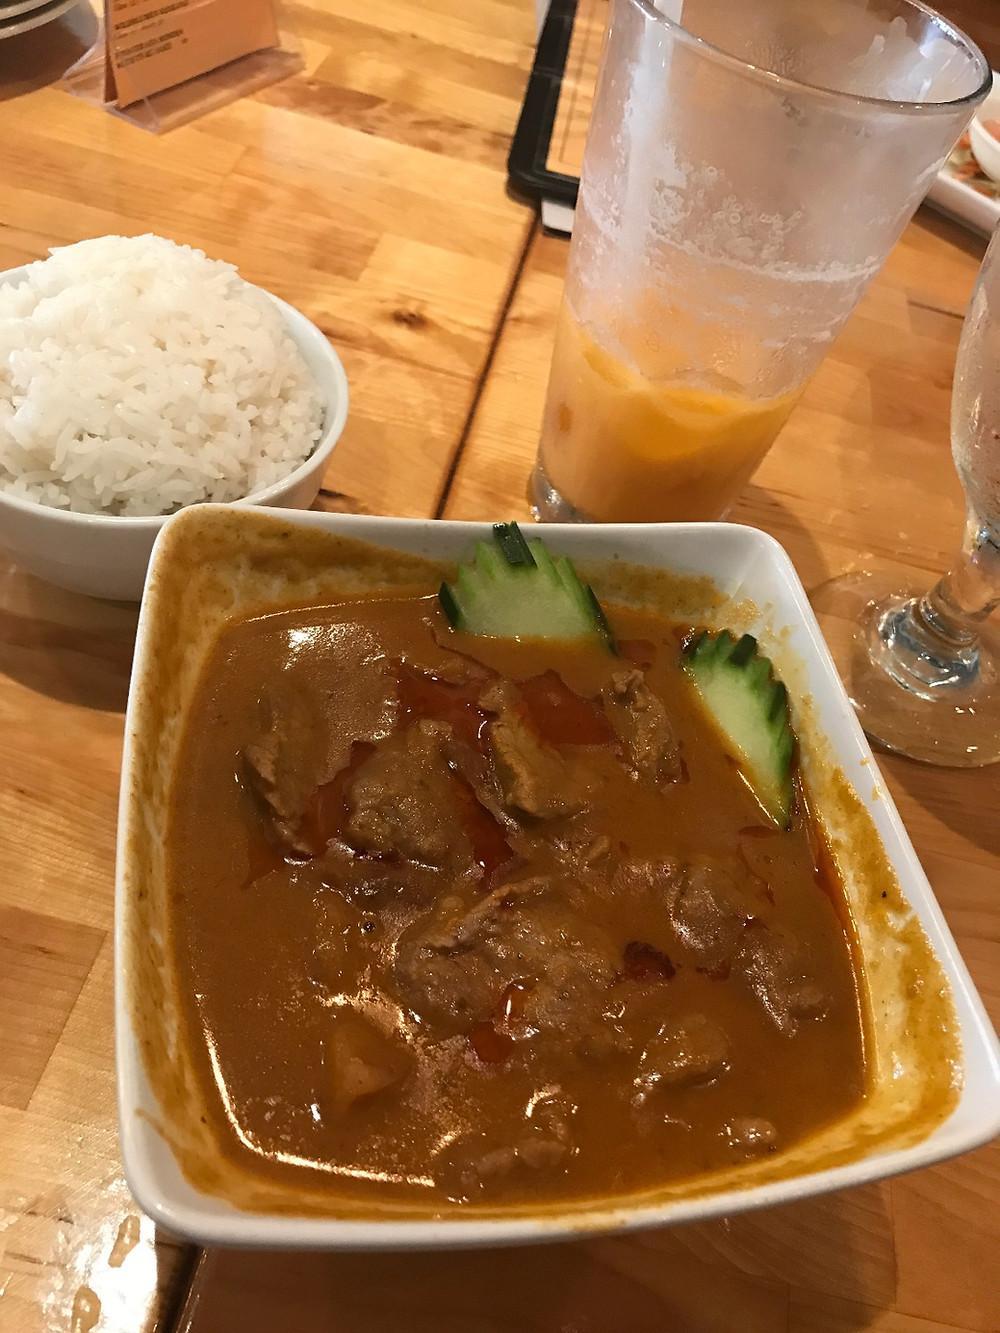 Mamak-Asian-Street-Food-Orlando-Food-Orlando-Food-Blog